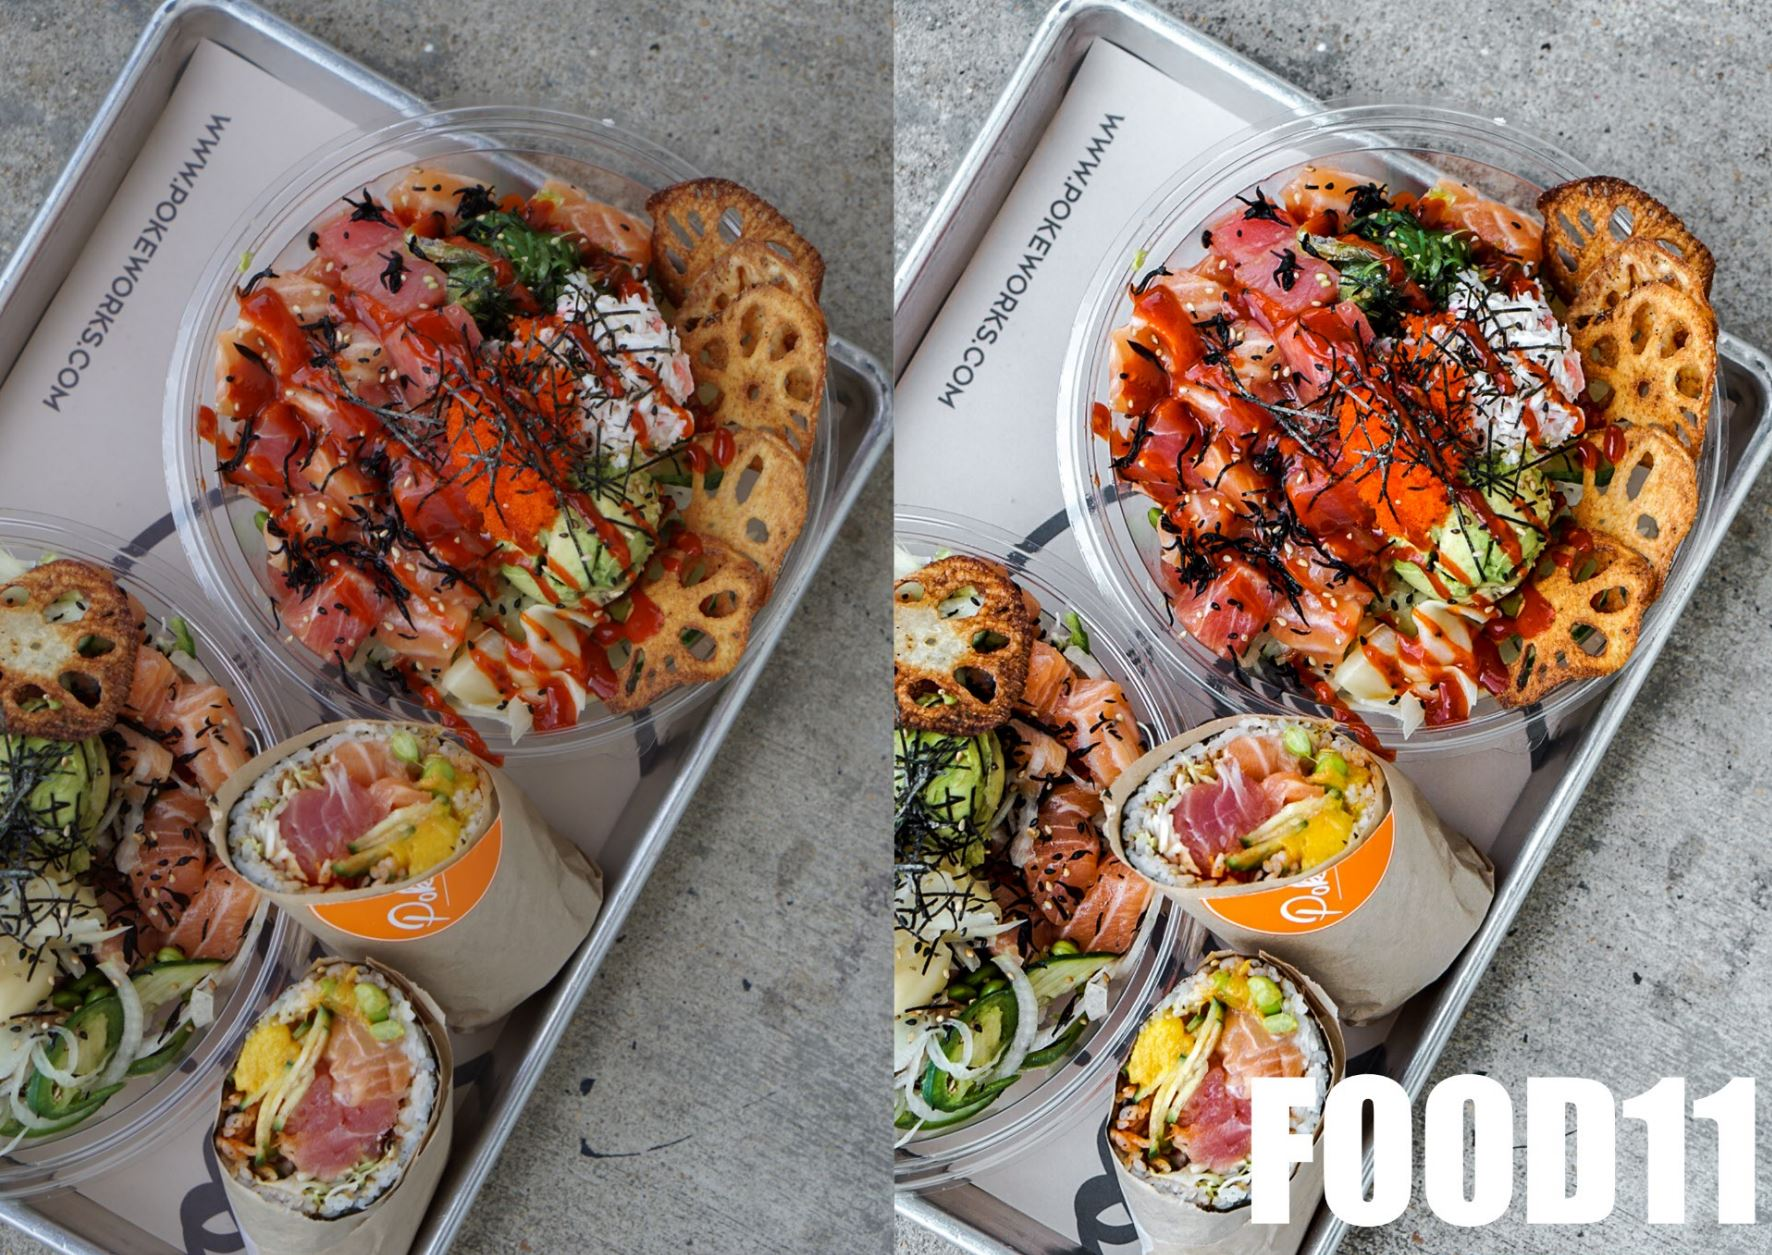 FOOD11redo.JPG